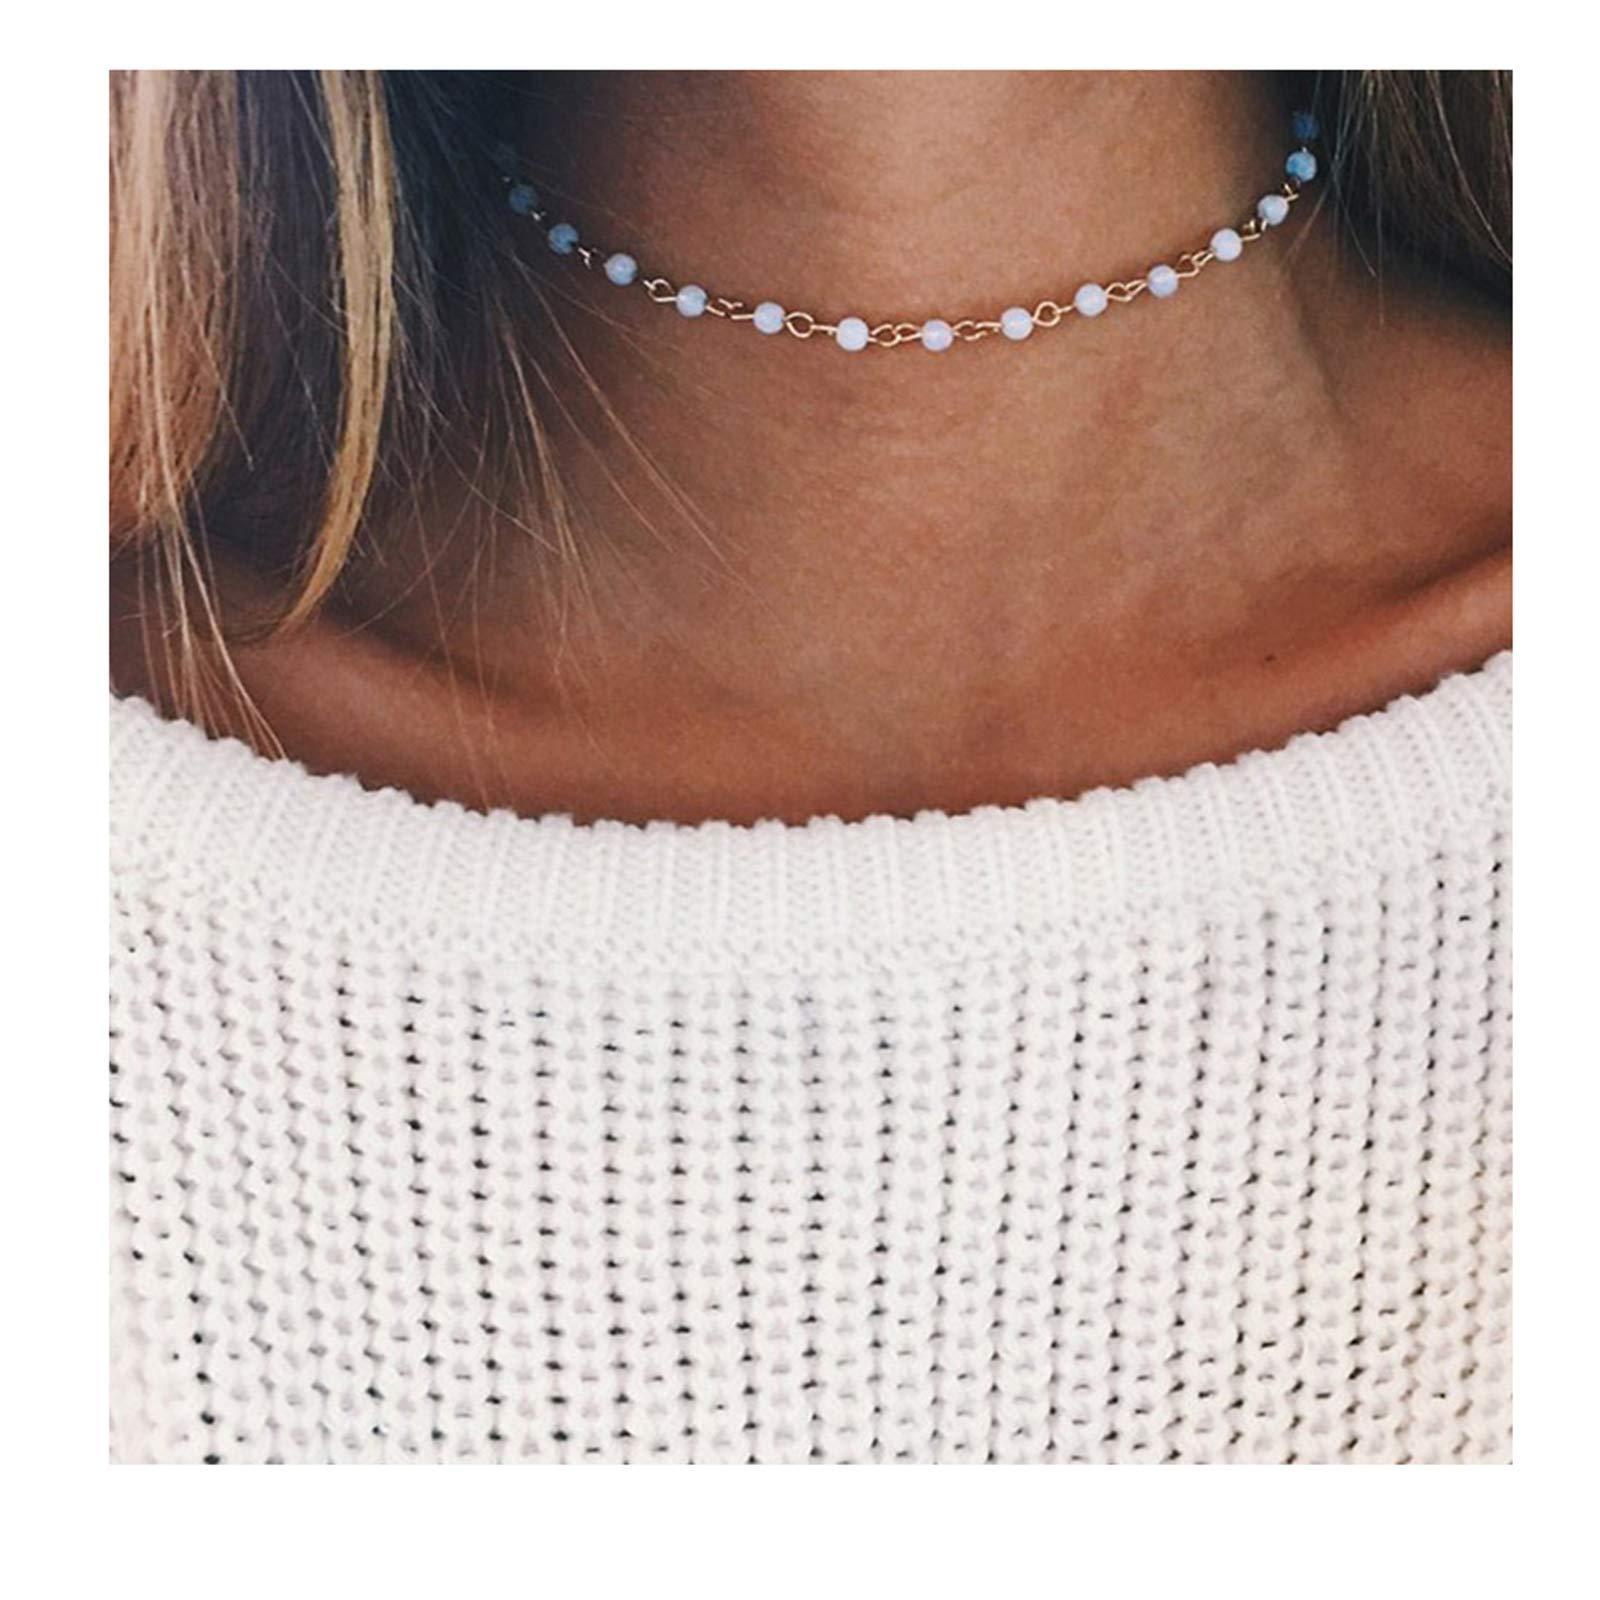 Fettero Dainty Gold Chocker Handmade Beaded 14K Gold Fill White Opal Lucky Necklace